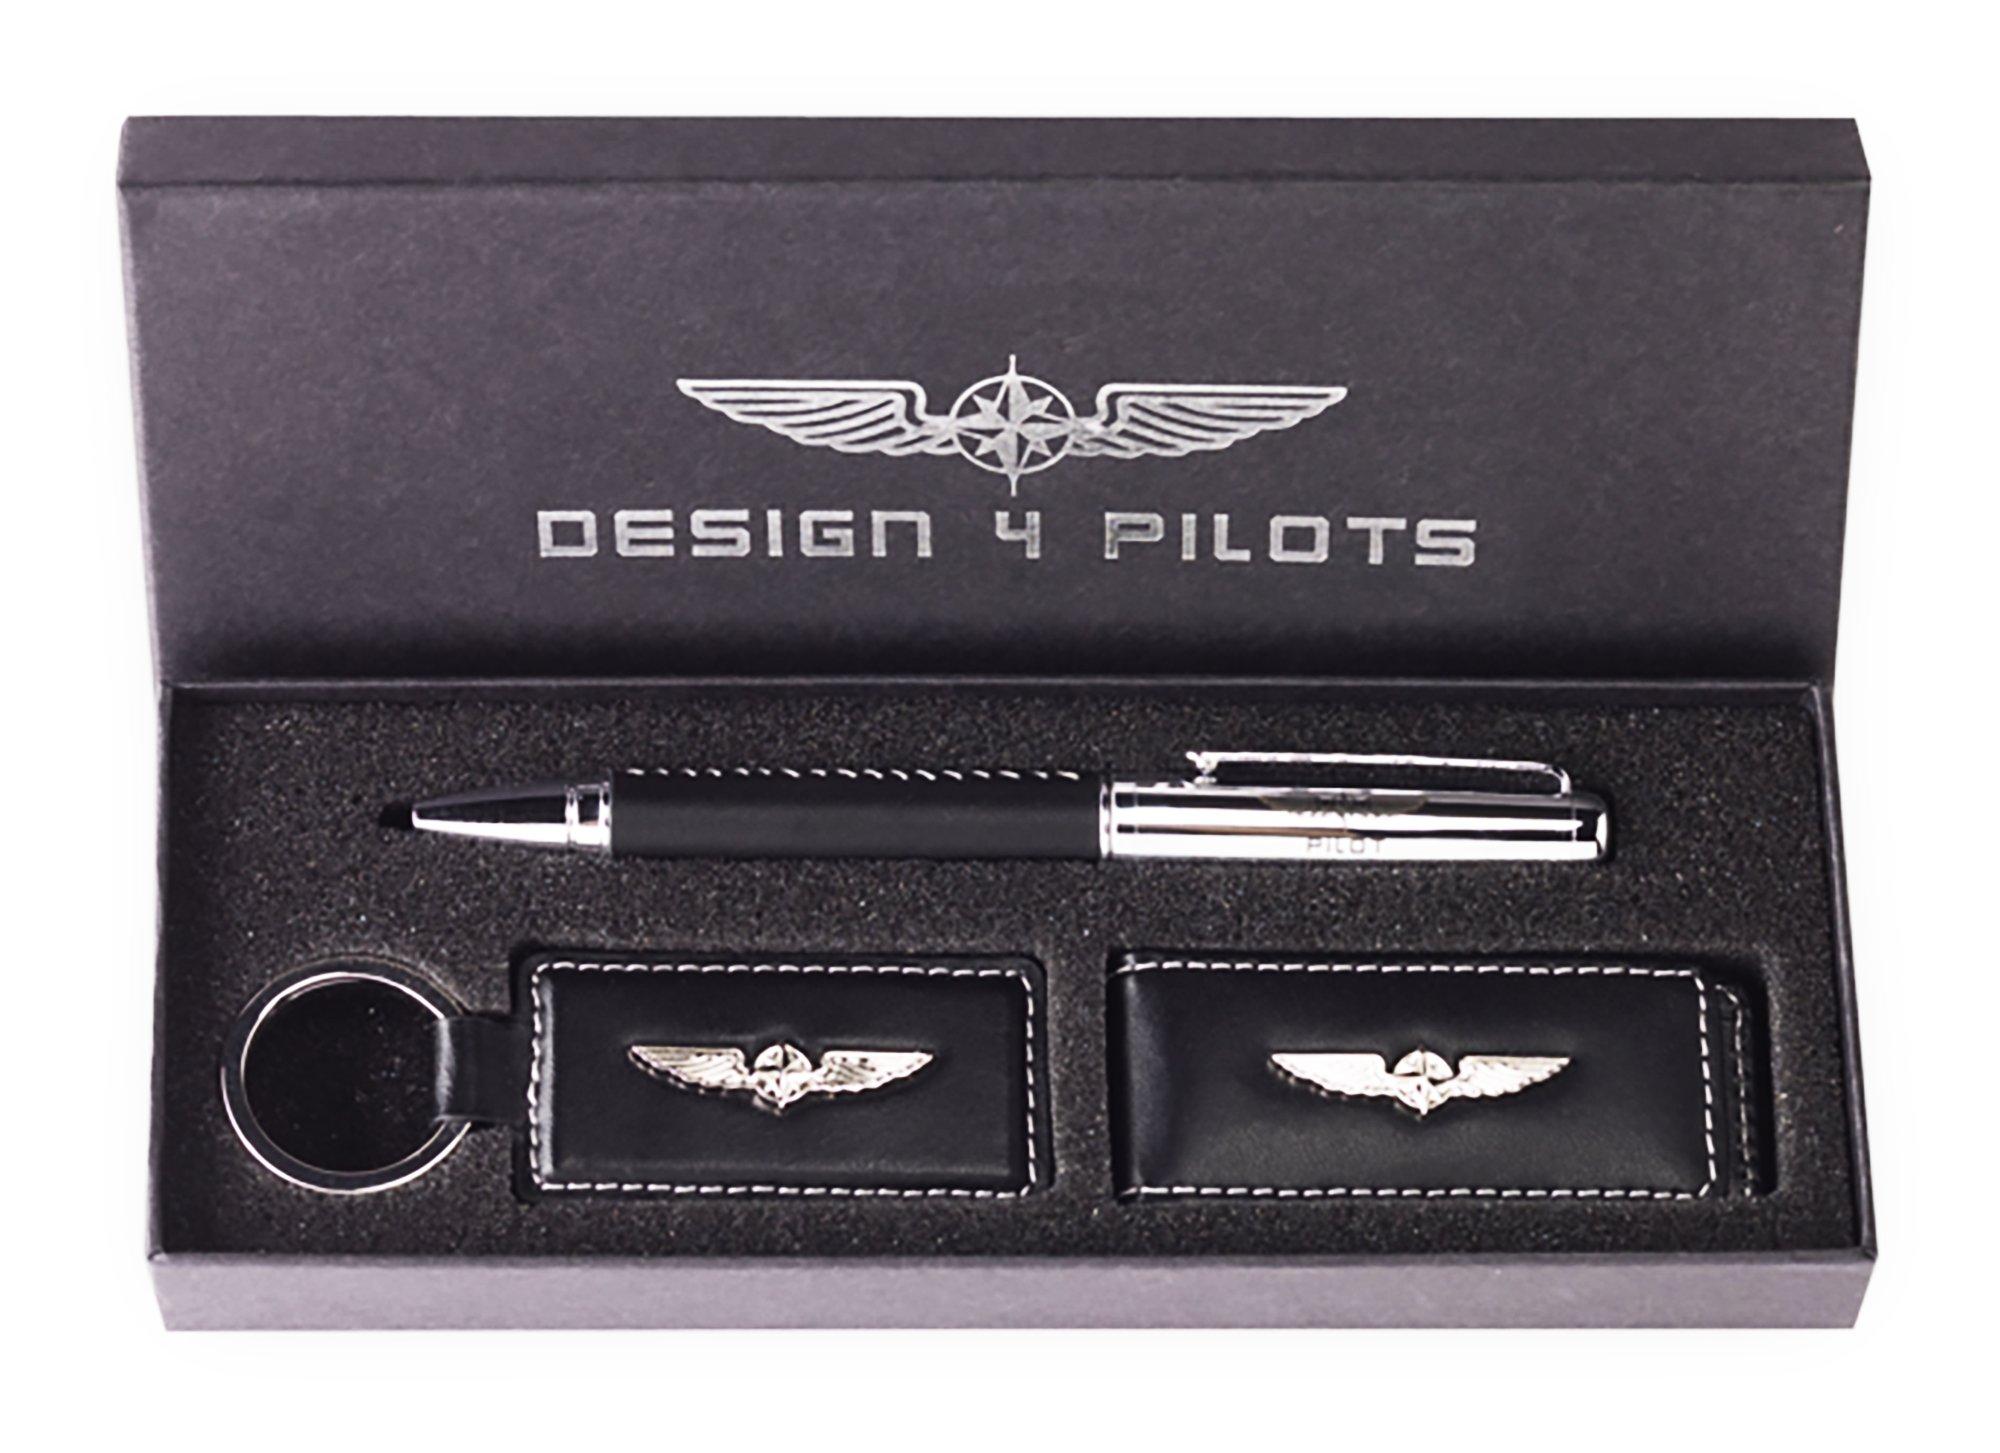 DESIGN 4 PILOTS Pilot Aviation Gift, Brand Pen, Key Fob and Money Clip Set, eco-Friendly Leather, Elegant Design,